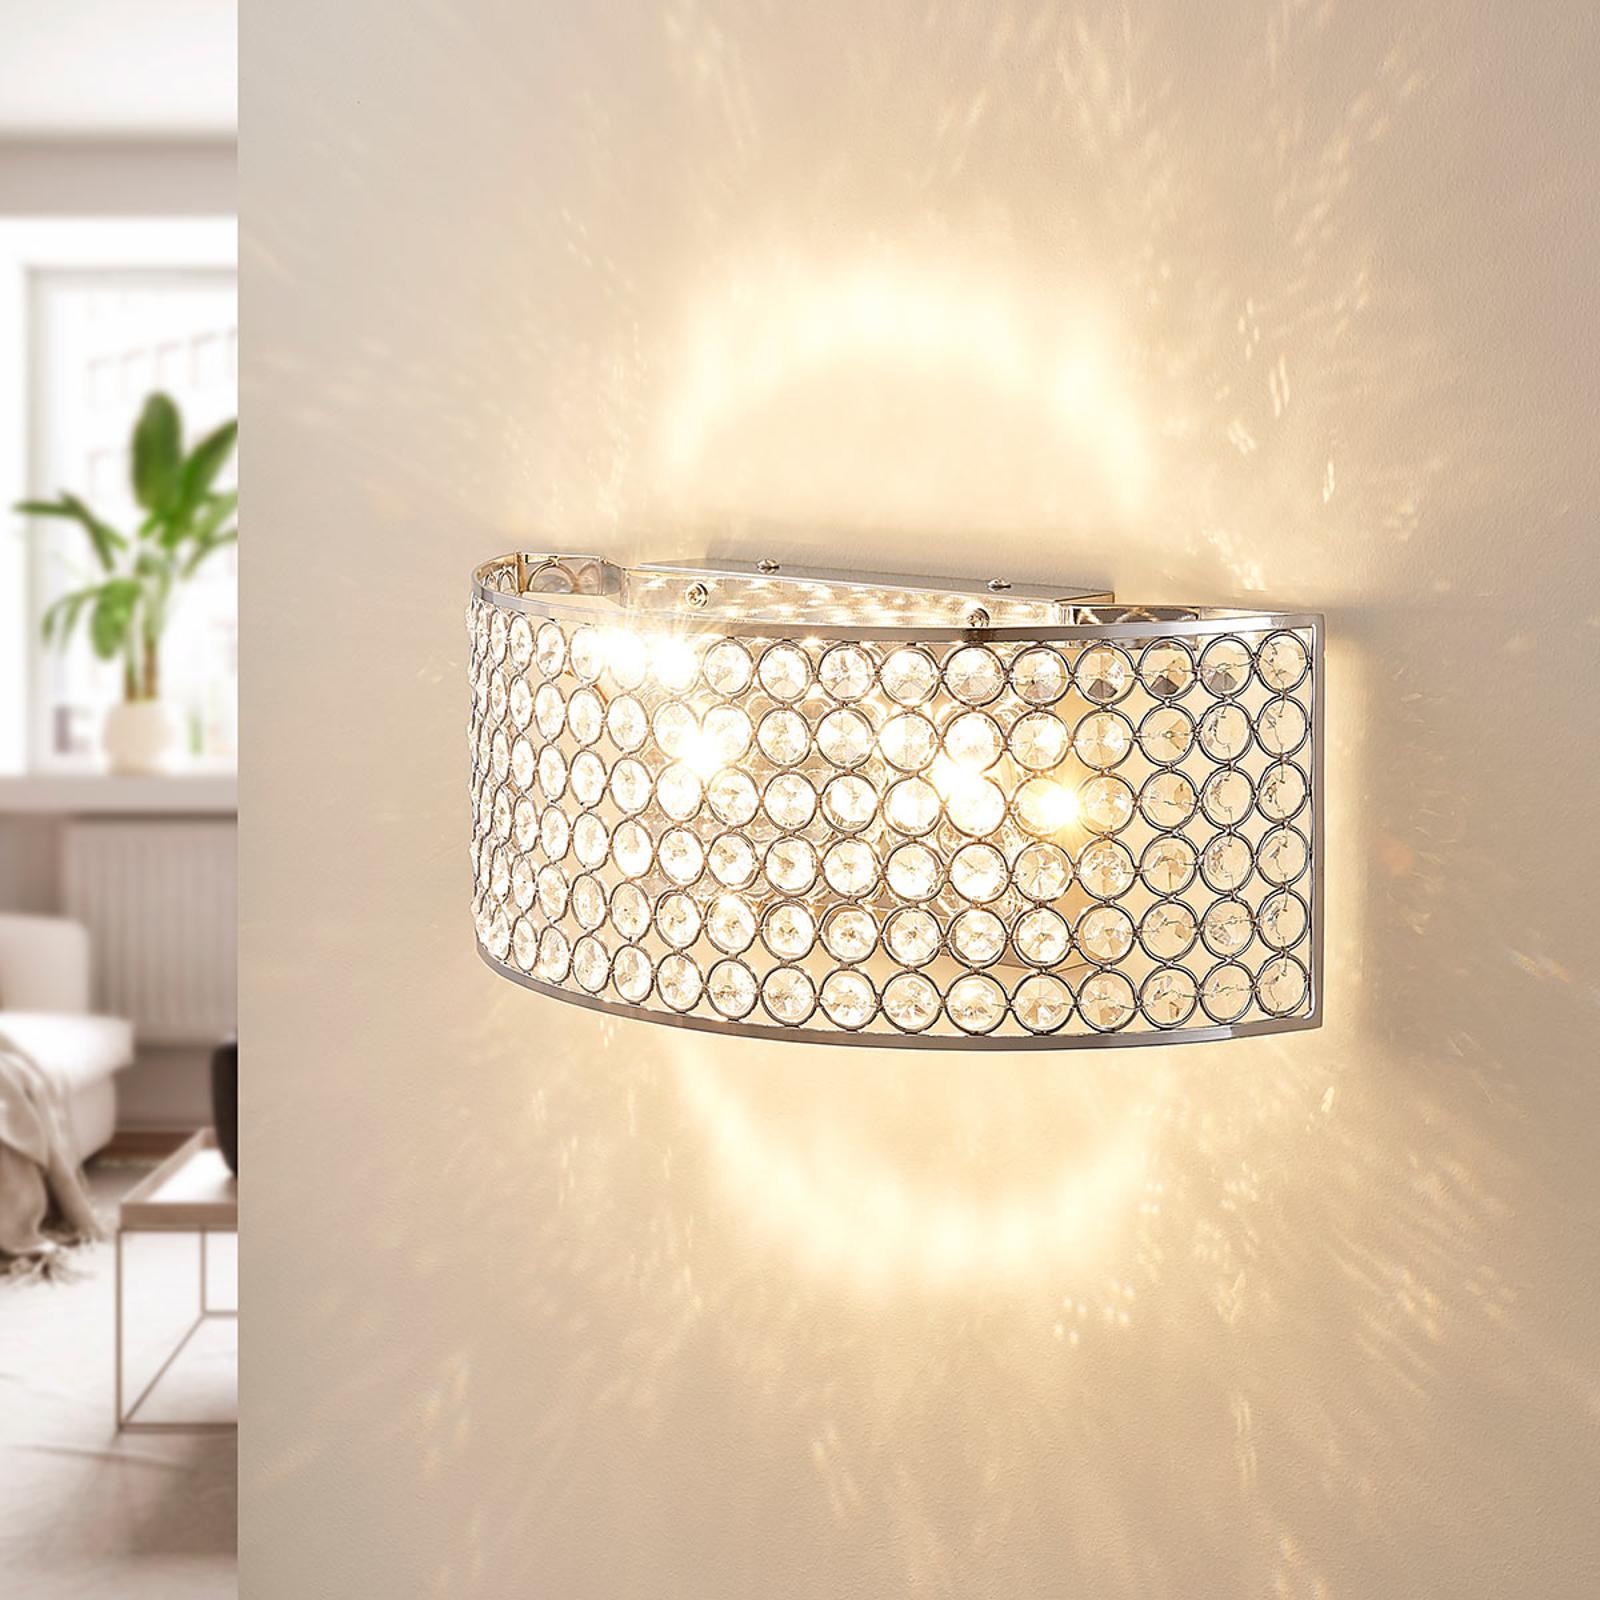 LED-vegglampe i krystall Alizee i krom